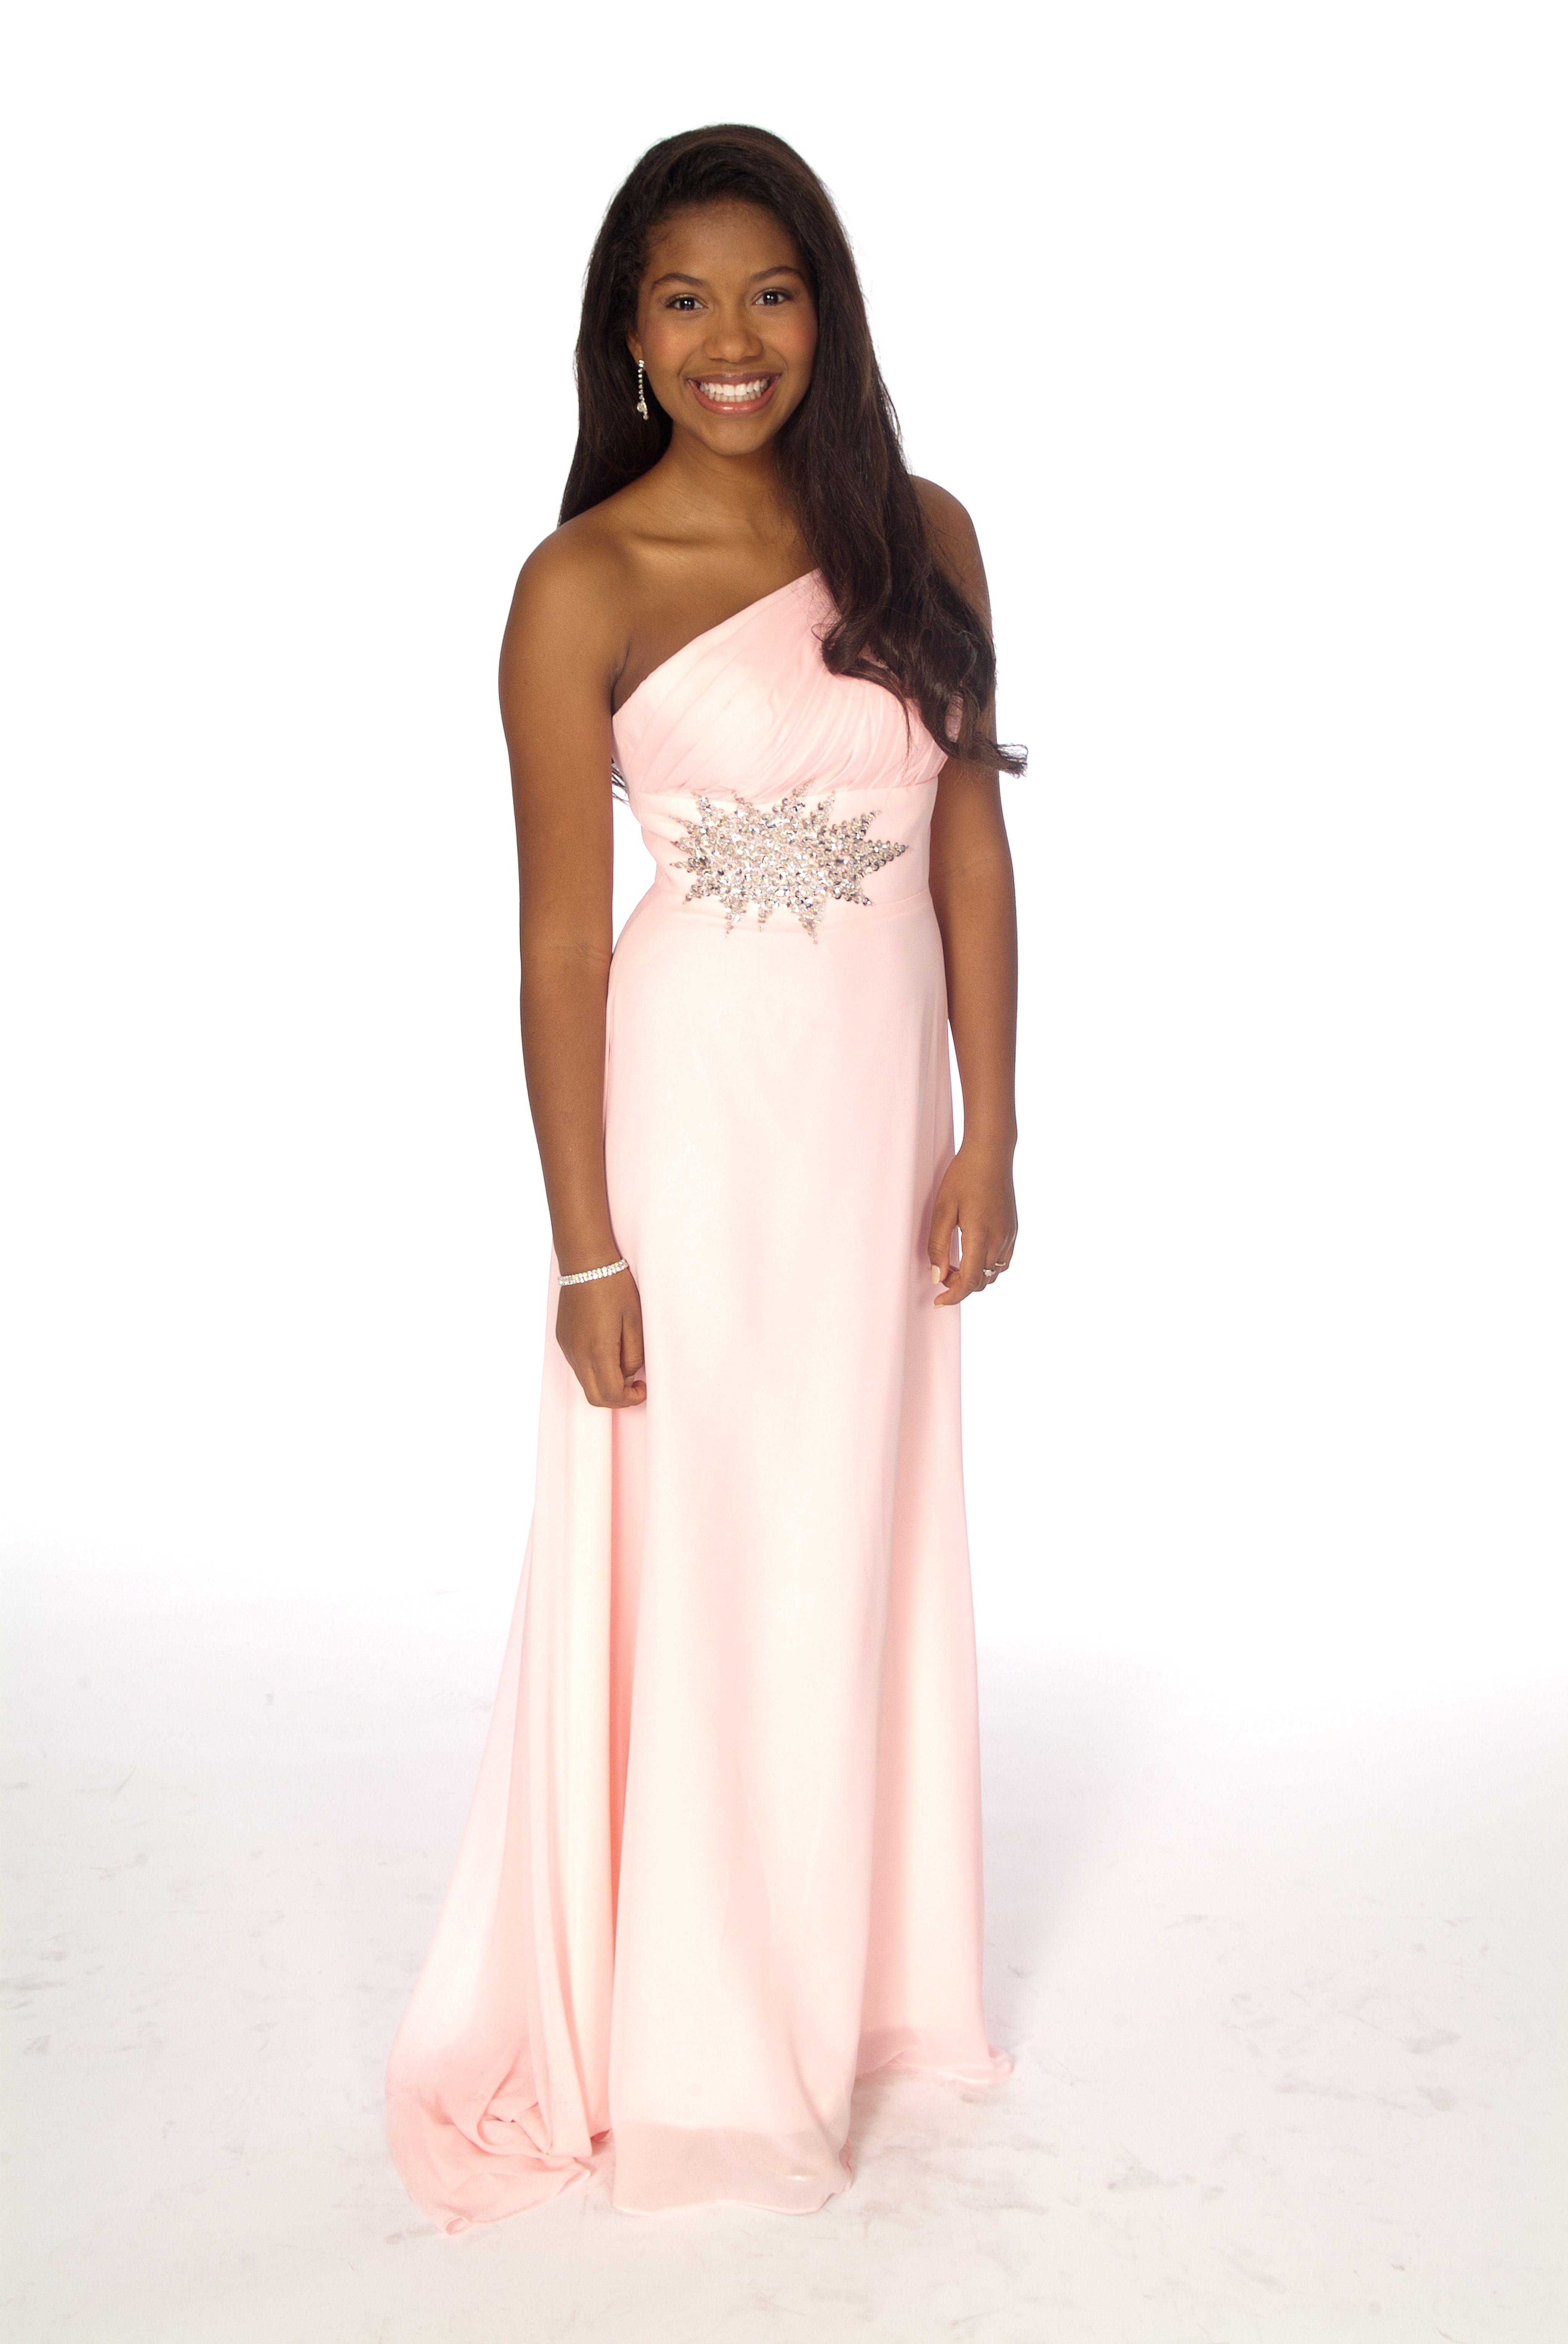 World miss supermodel pageant teen